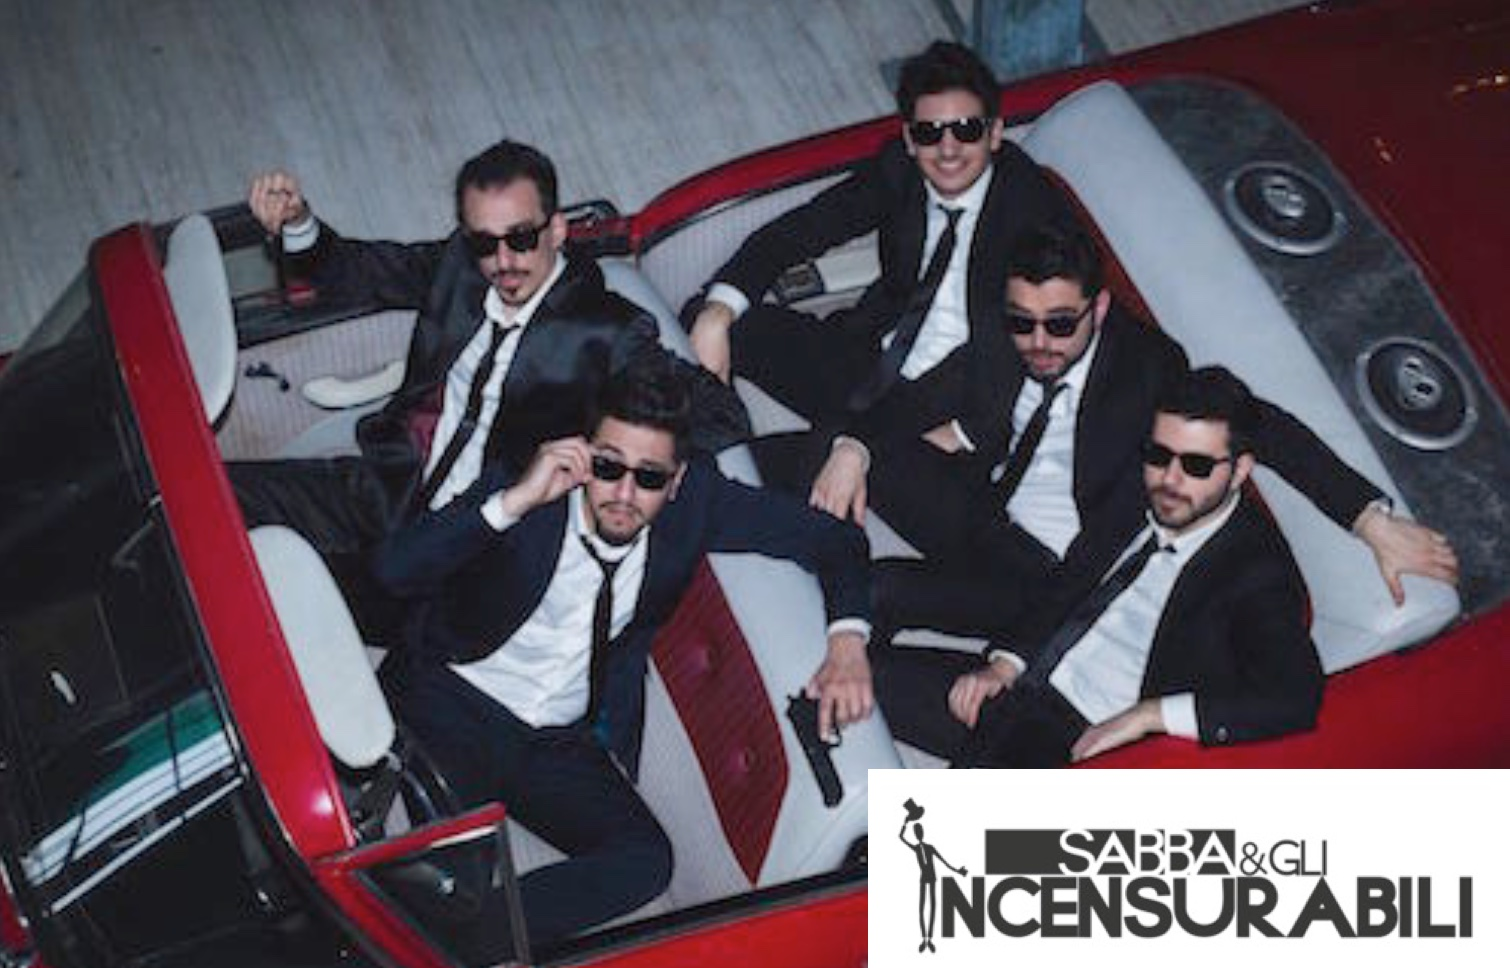 2016.01.07 - NMN 8 Sabba  Gli Incensurabili